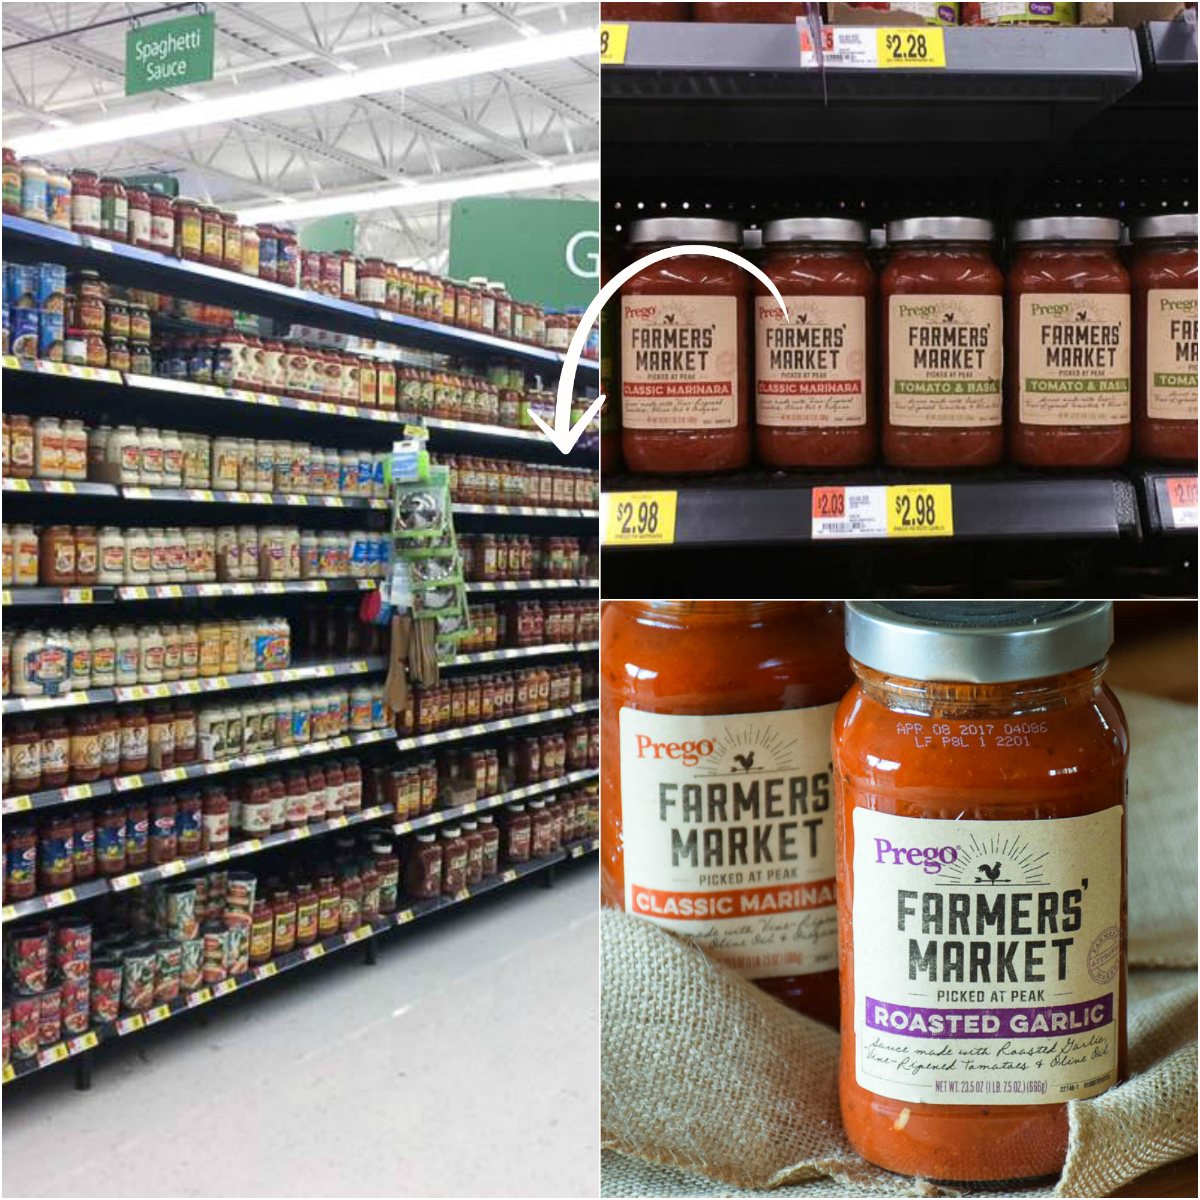 Walmart Store Collage Prego Farmers' Market® Roasted Garlic